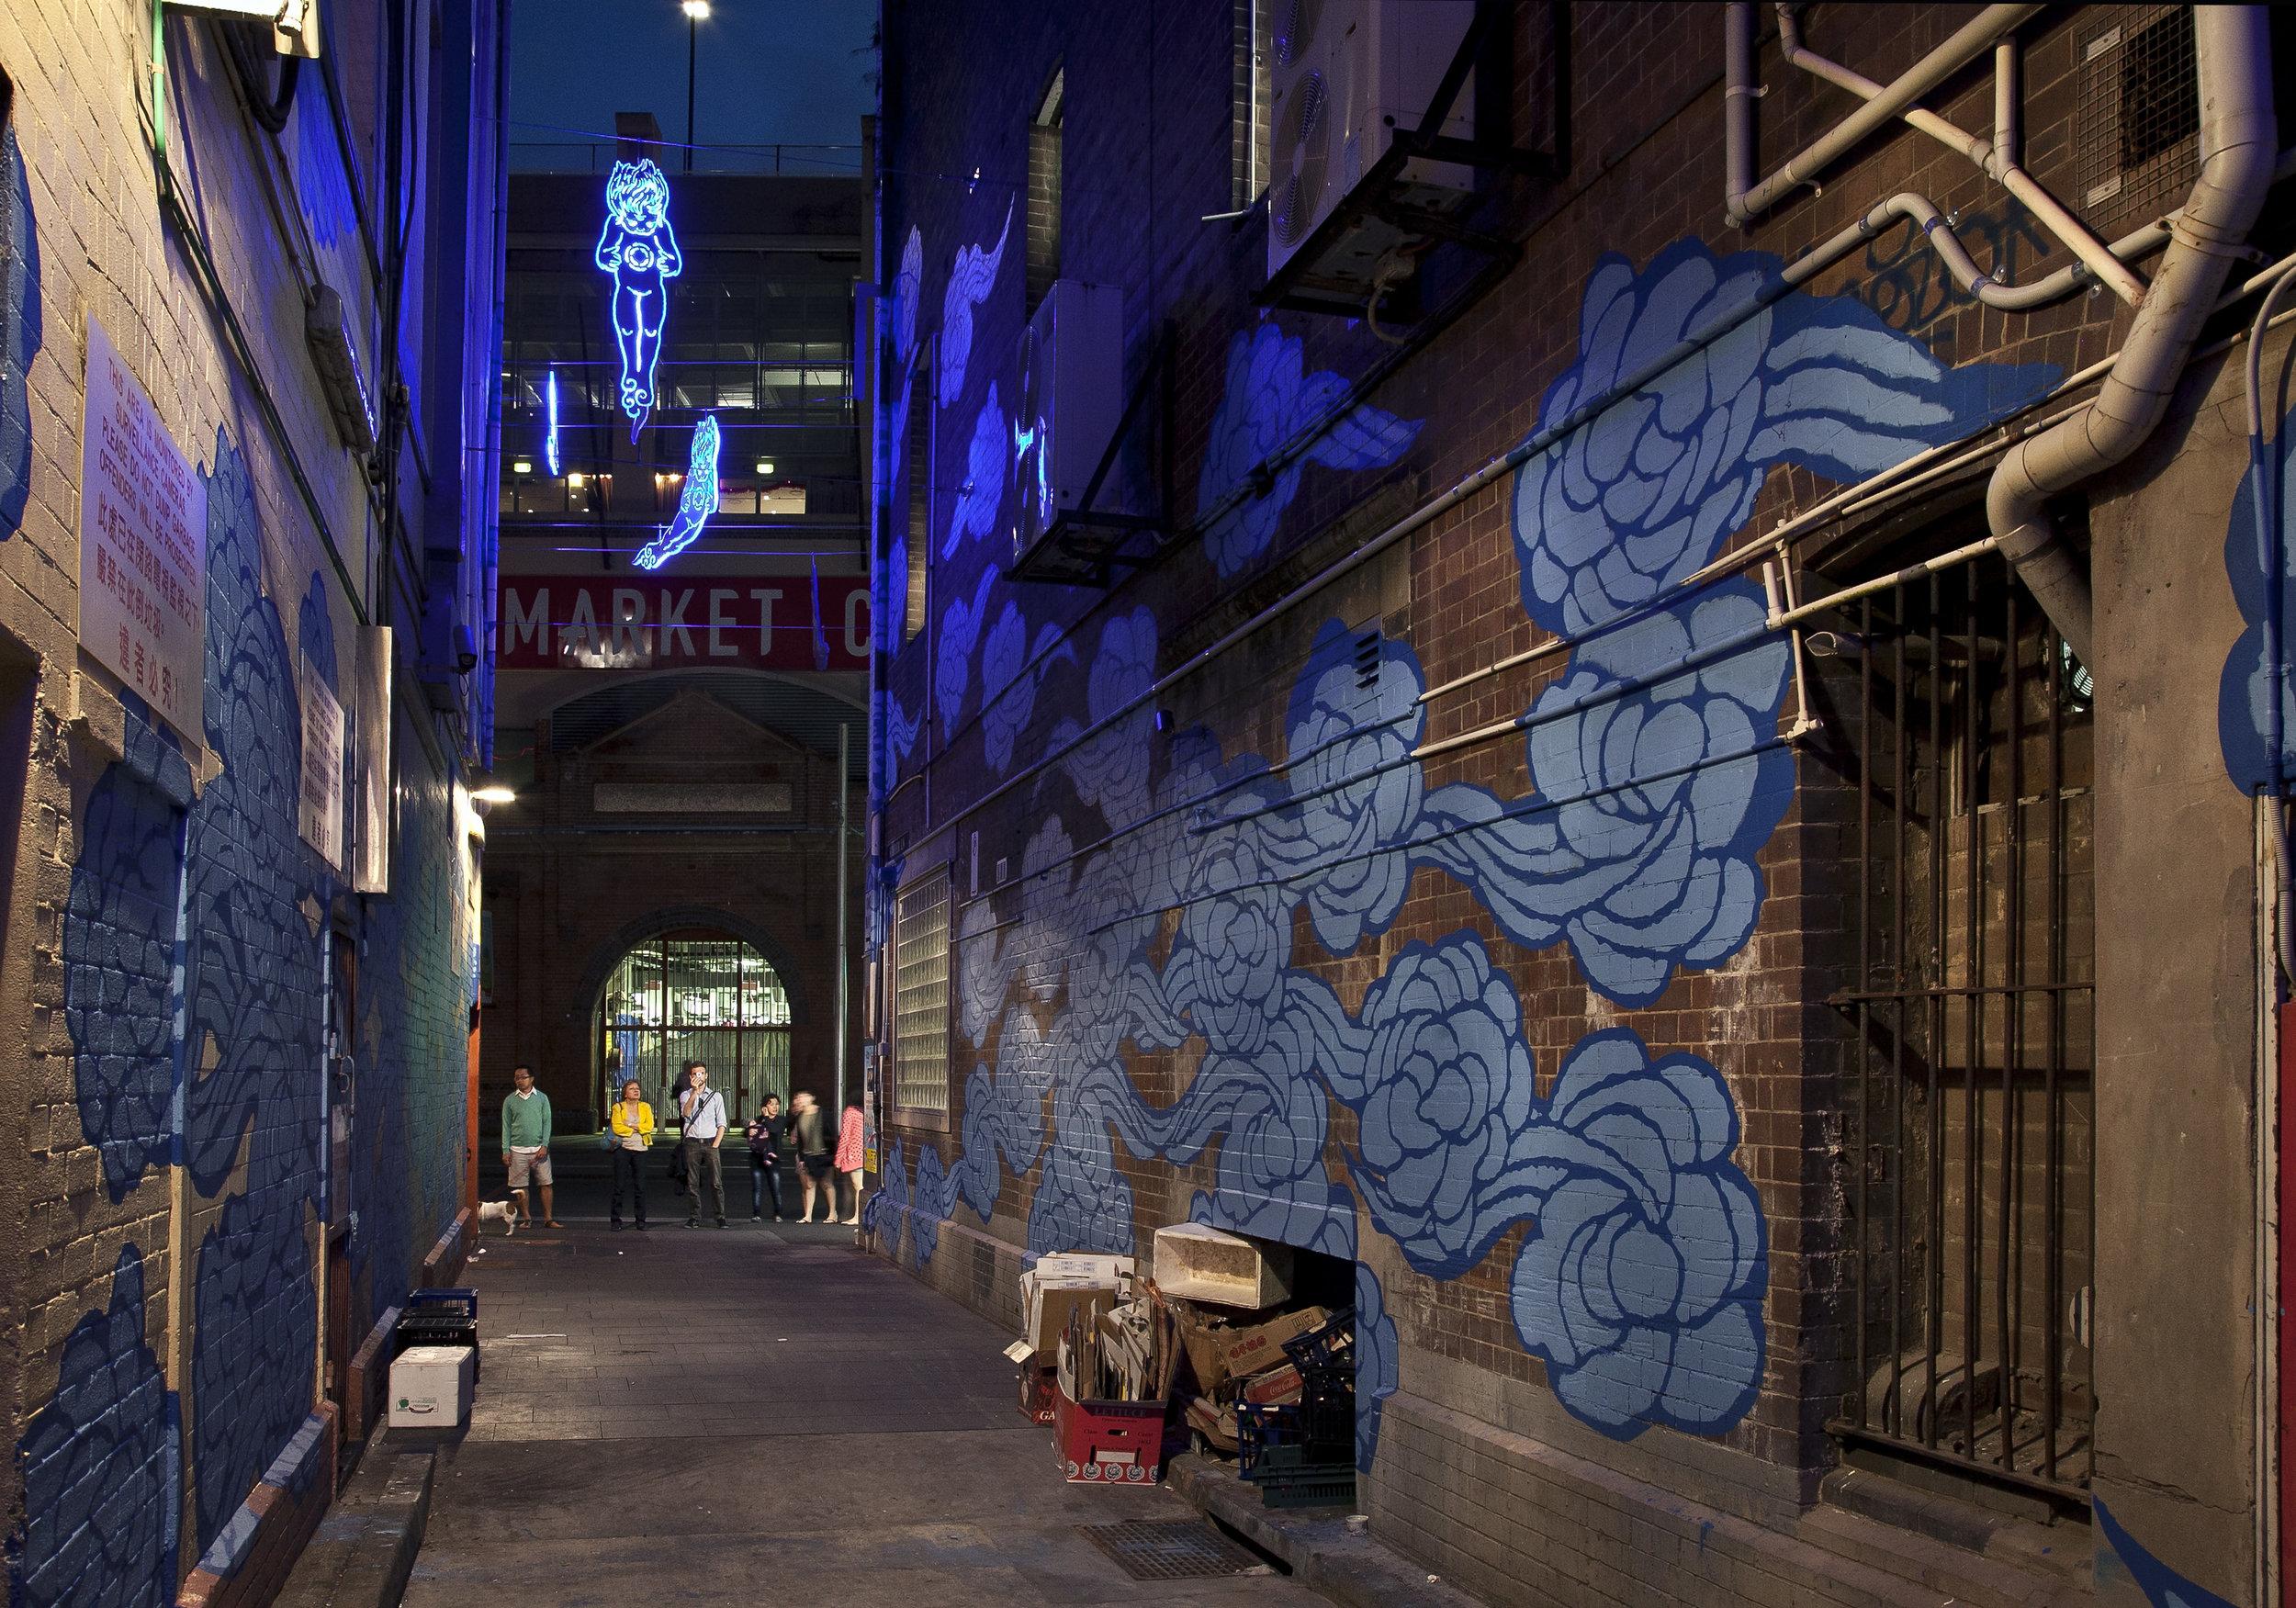 Kimber Lane lit up at night. Image Credit: Art Pharmacy Consulting.